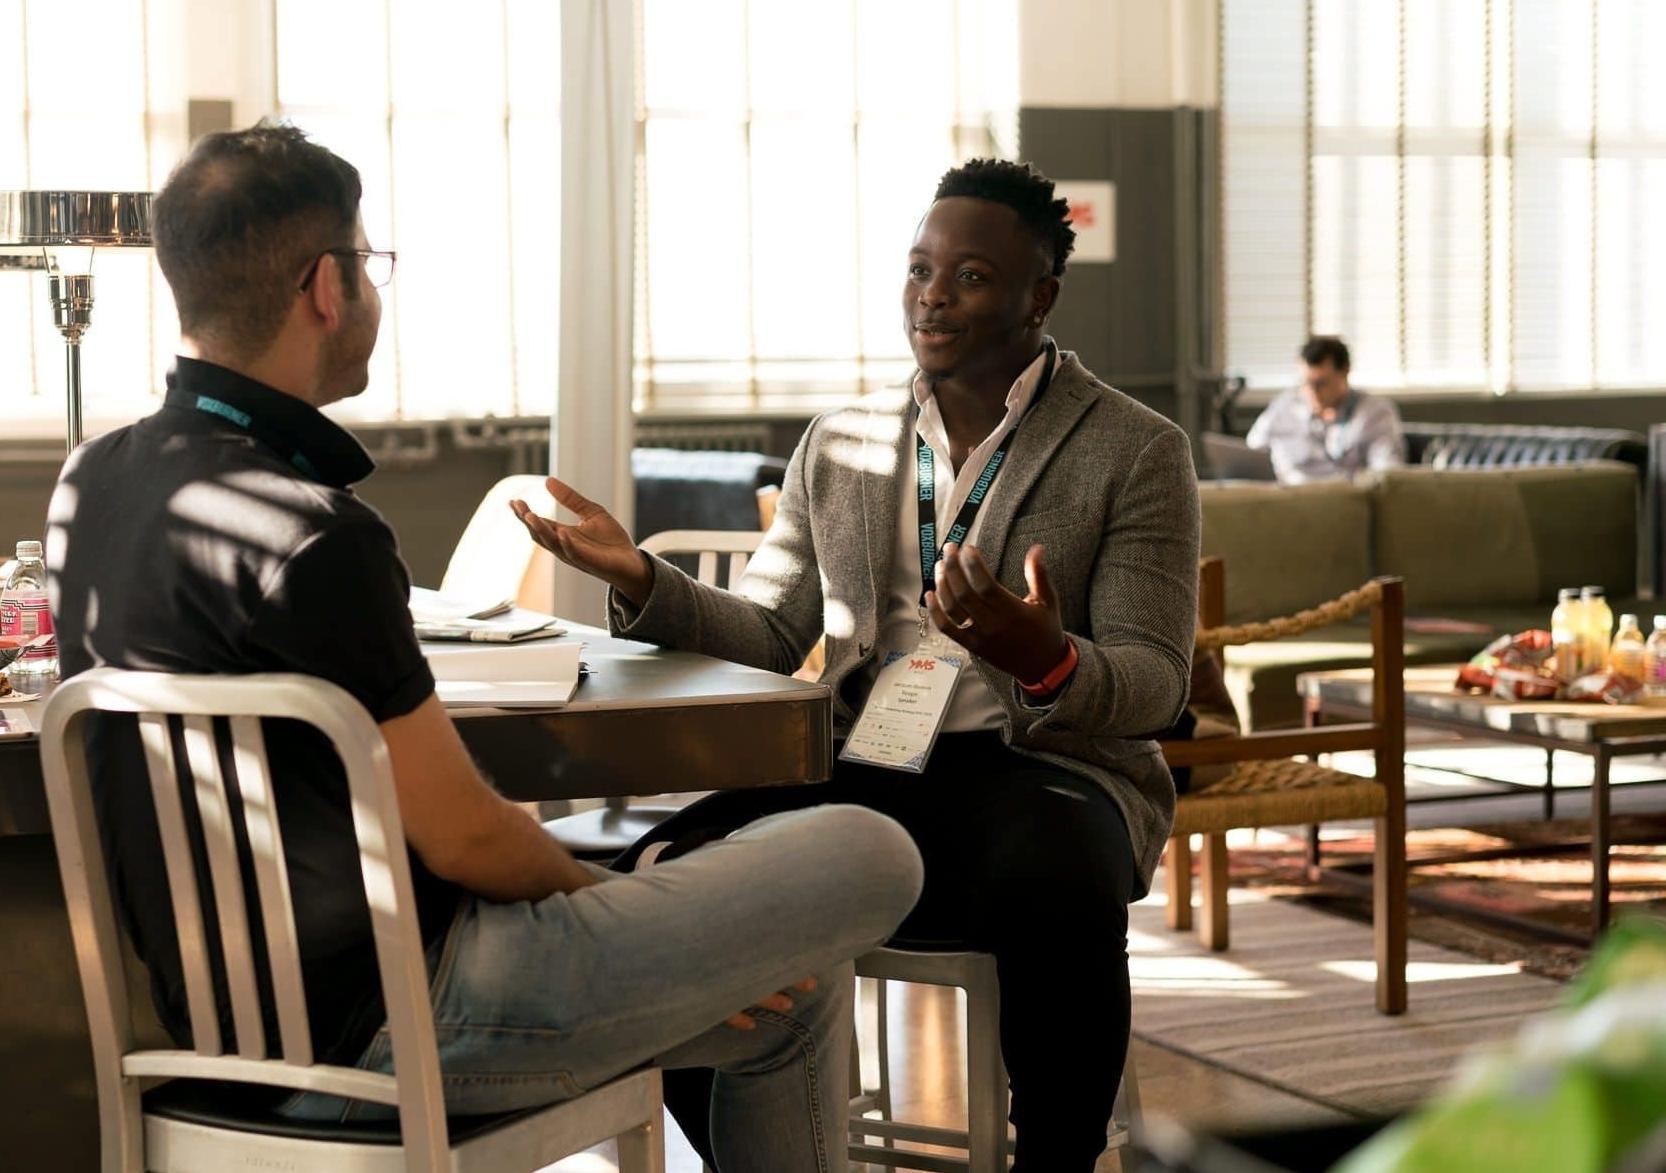 Men having conversation at work.